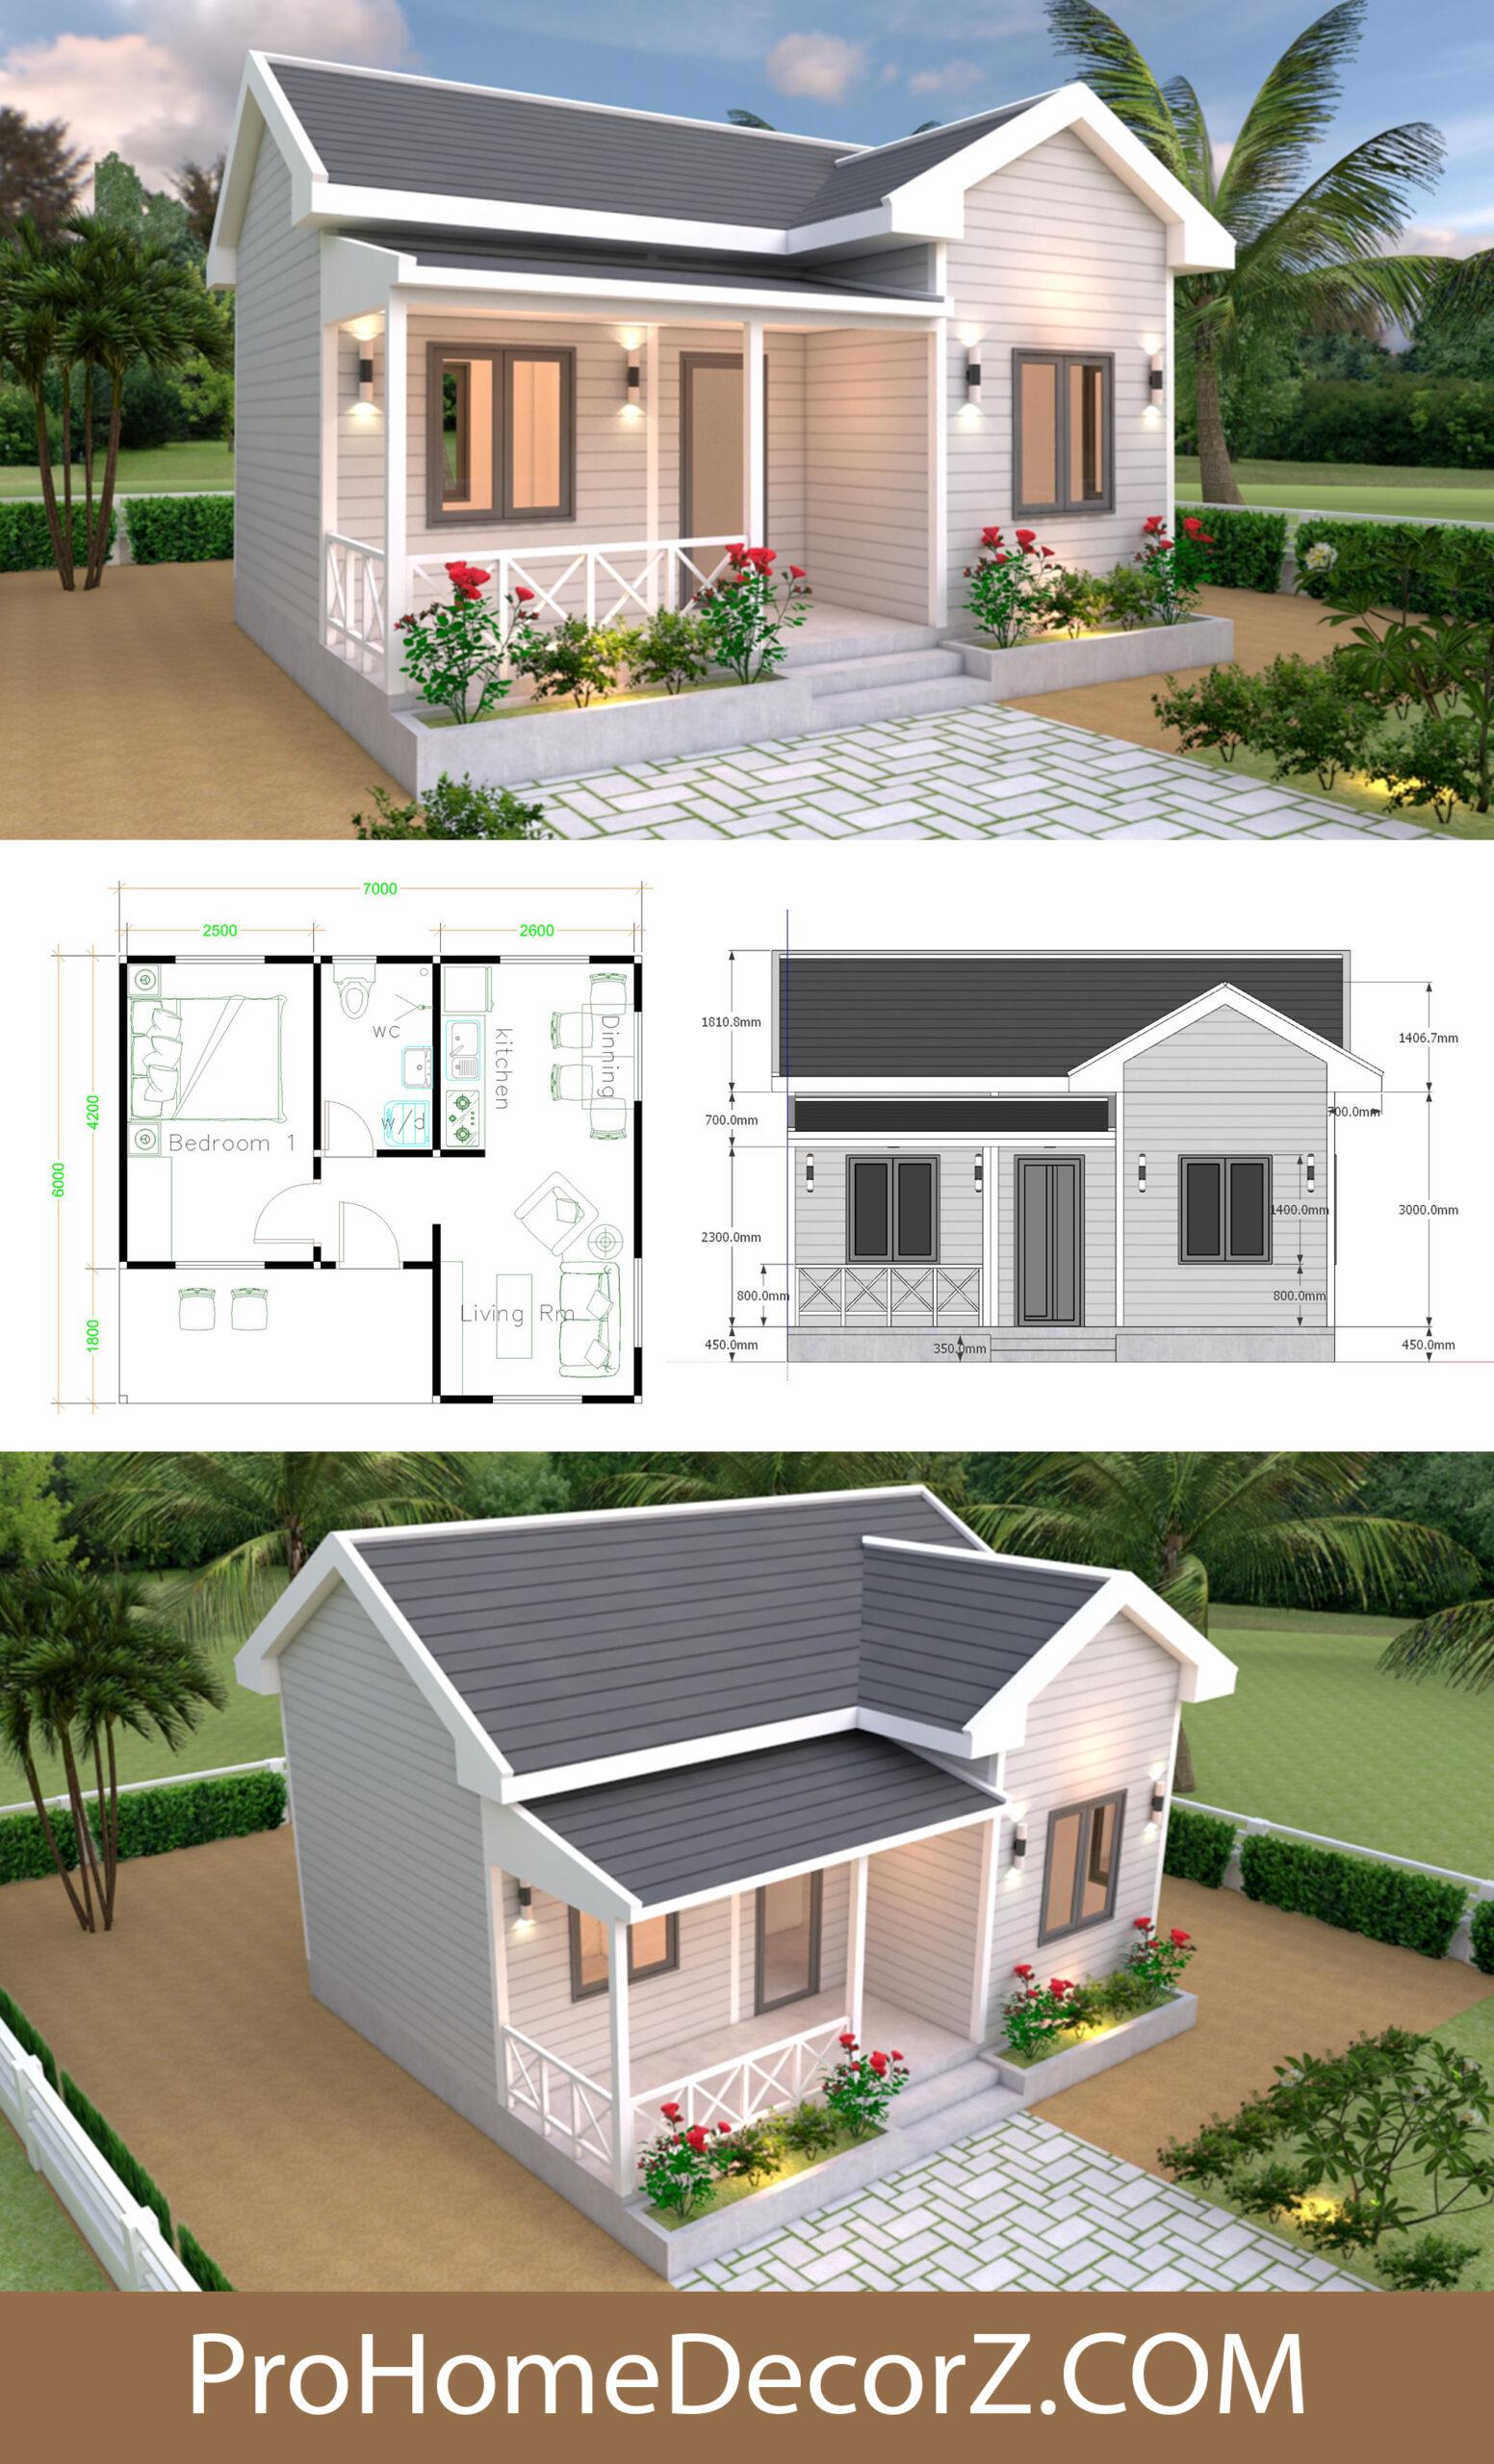 Gross gable Single Plans 7x6 Meters with Floor Plan